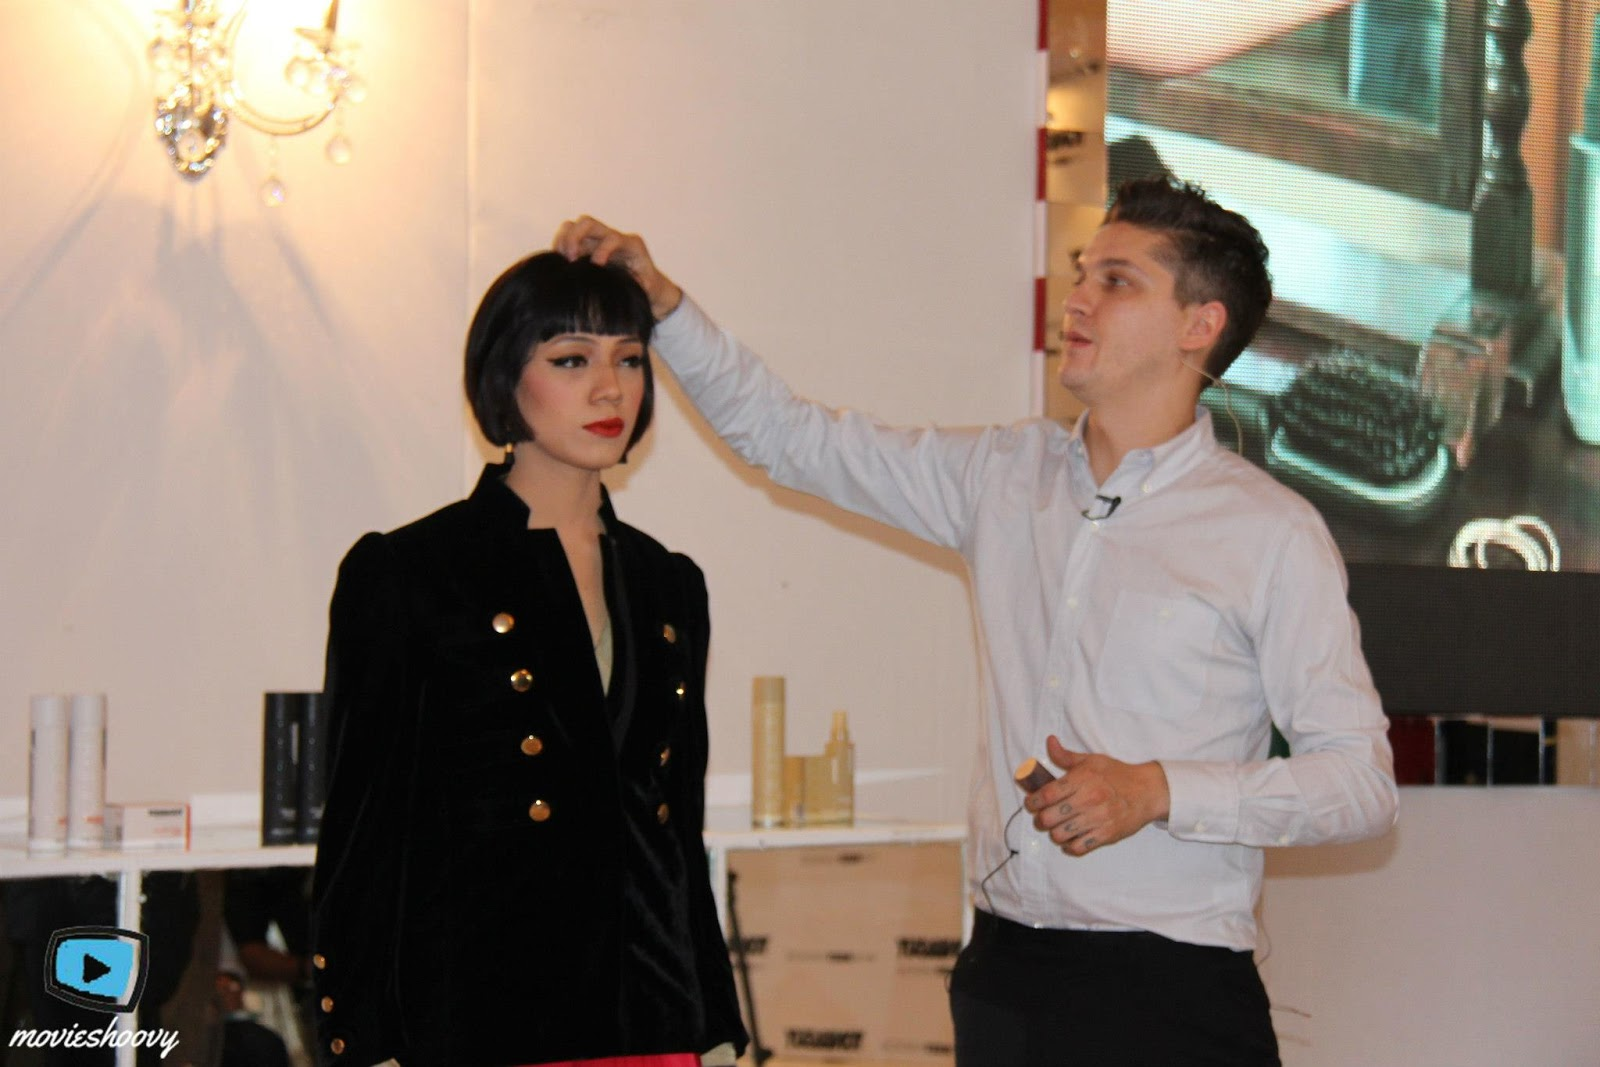 toni and guy hair meet wardrobe thailand bomb